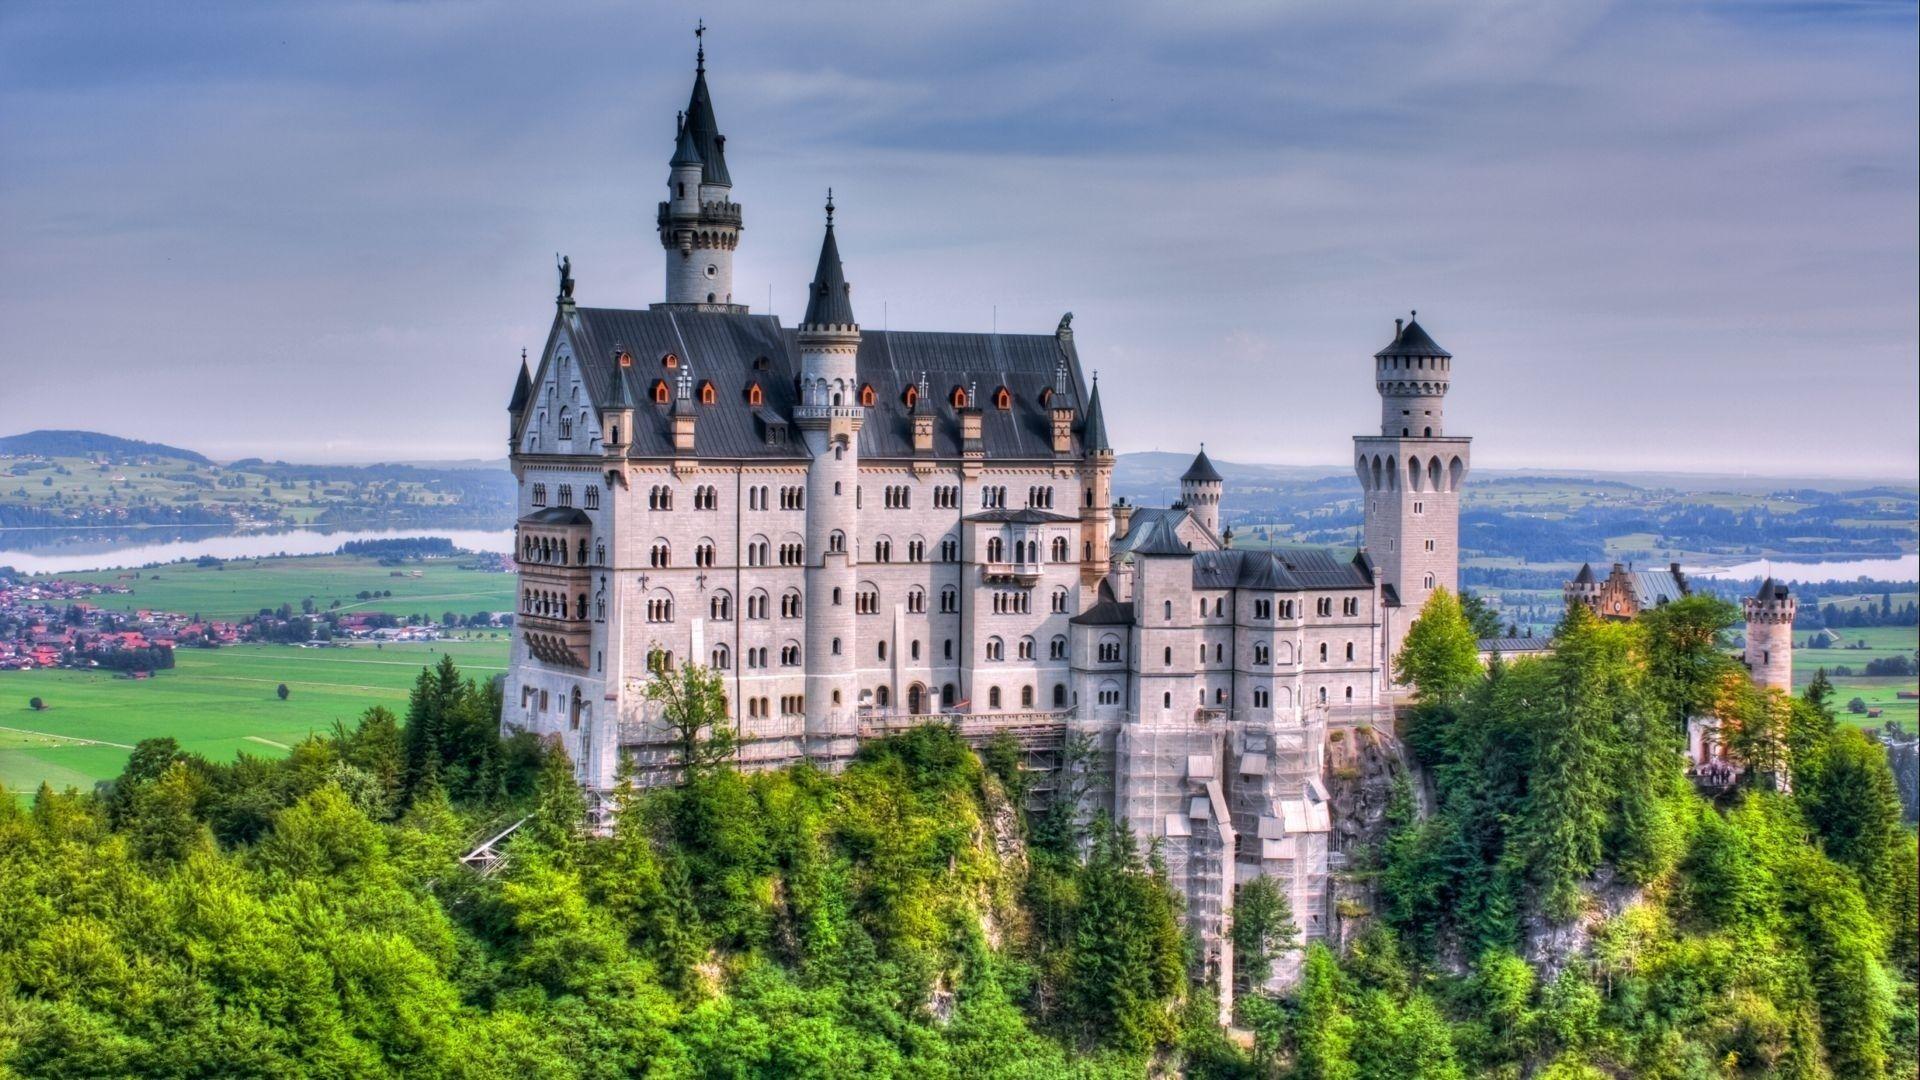 German Castle Wallpapers Top Free German Castle Backgrounds Wallpaperaccess